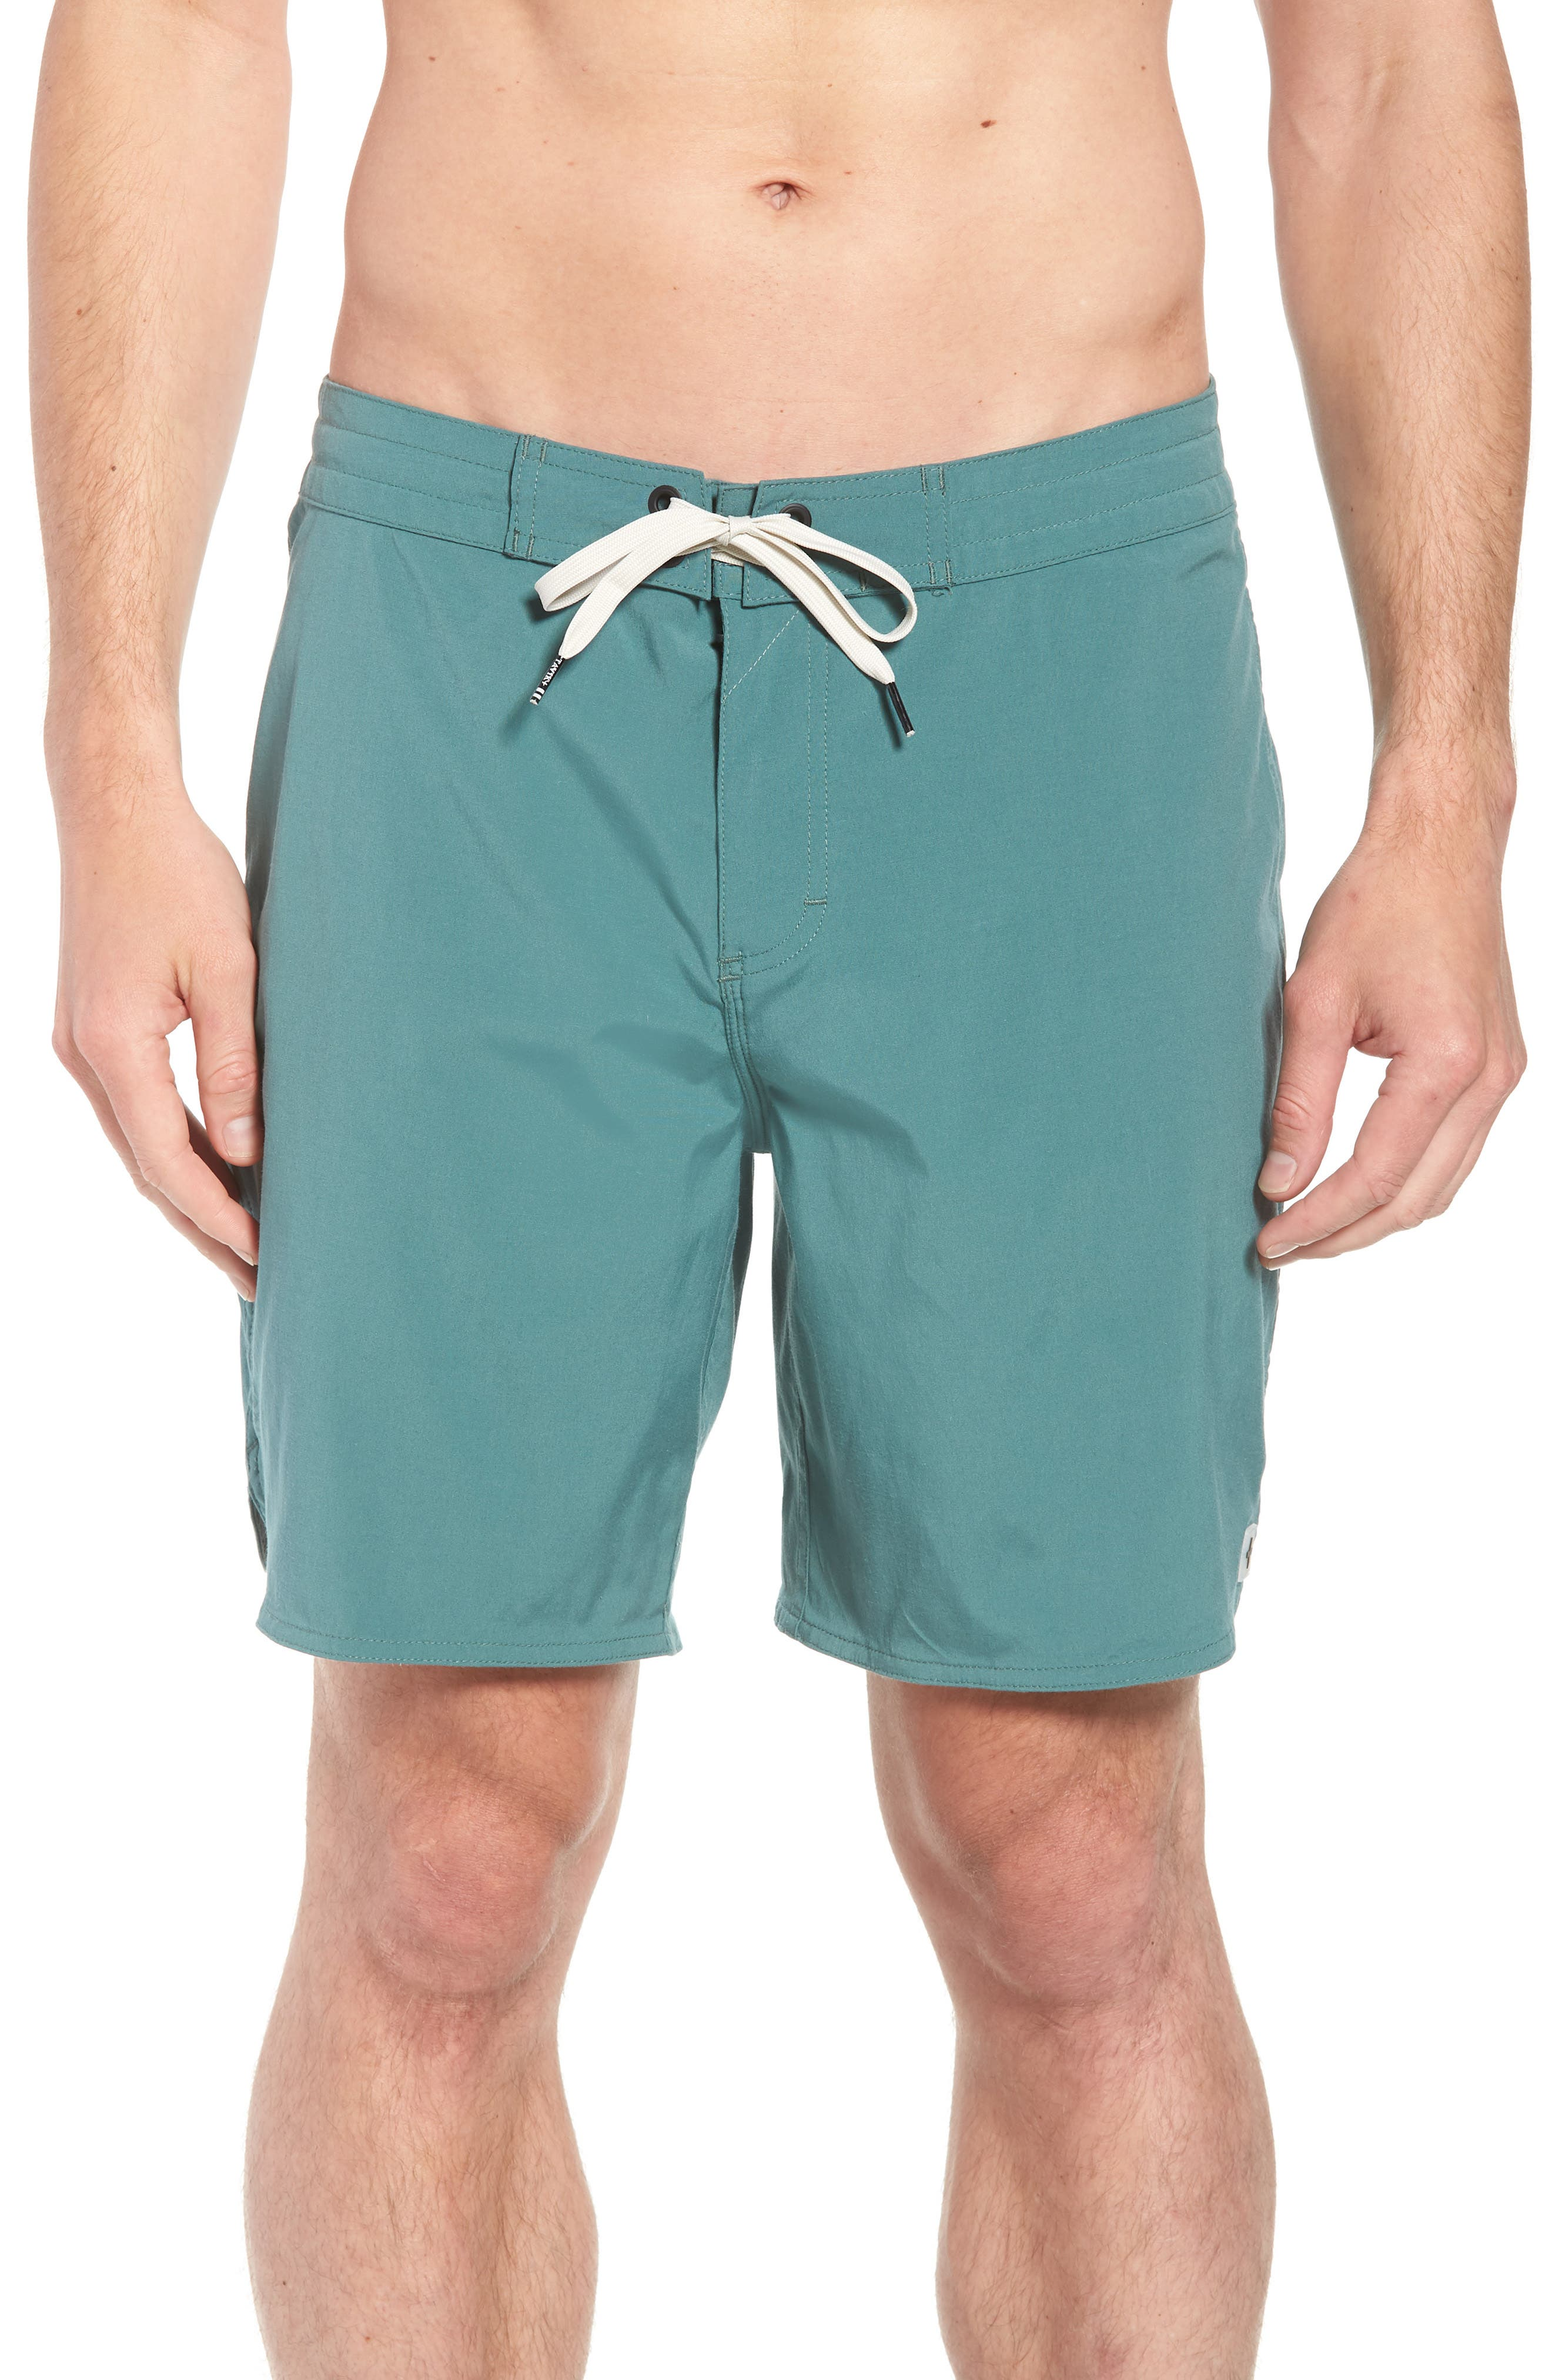 Avalon Board Shorts,                             Main thumbnail 1, color,                             Palm Green